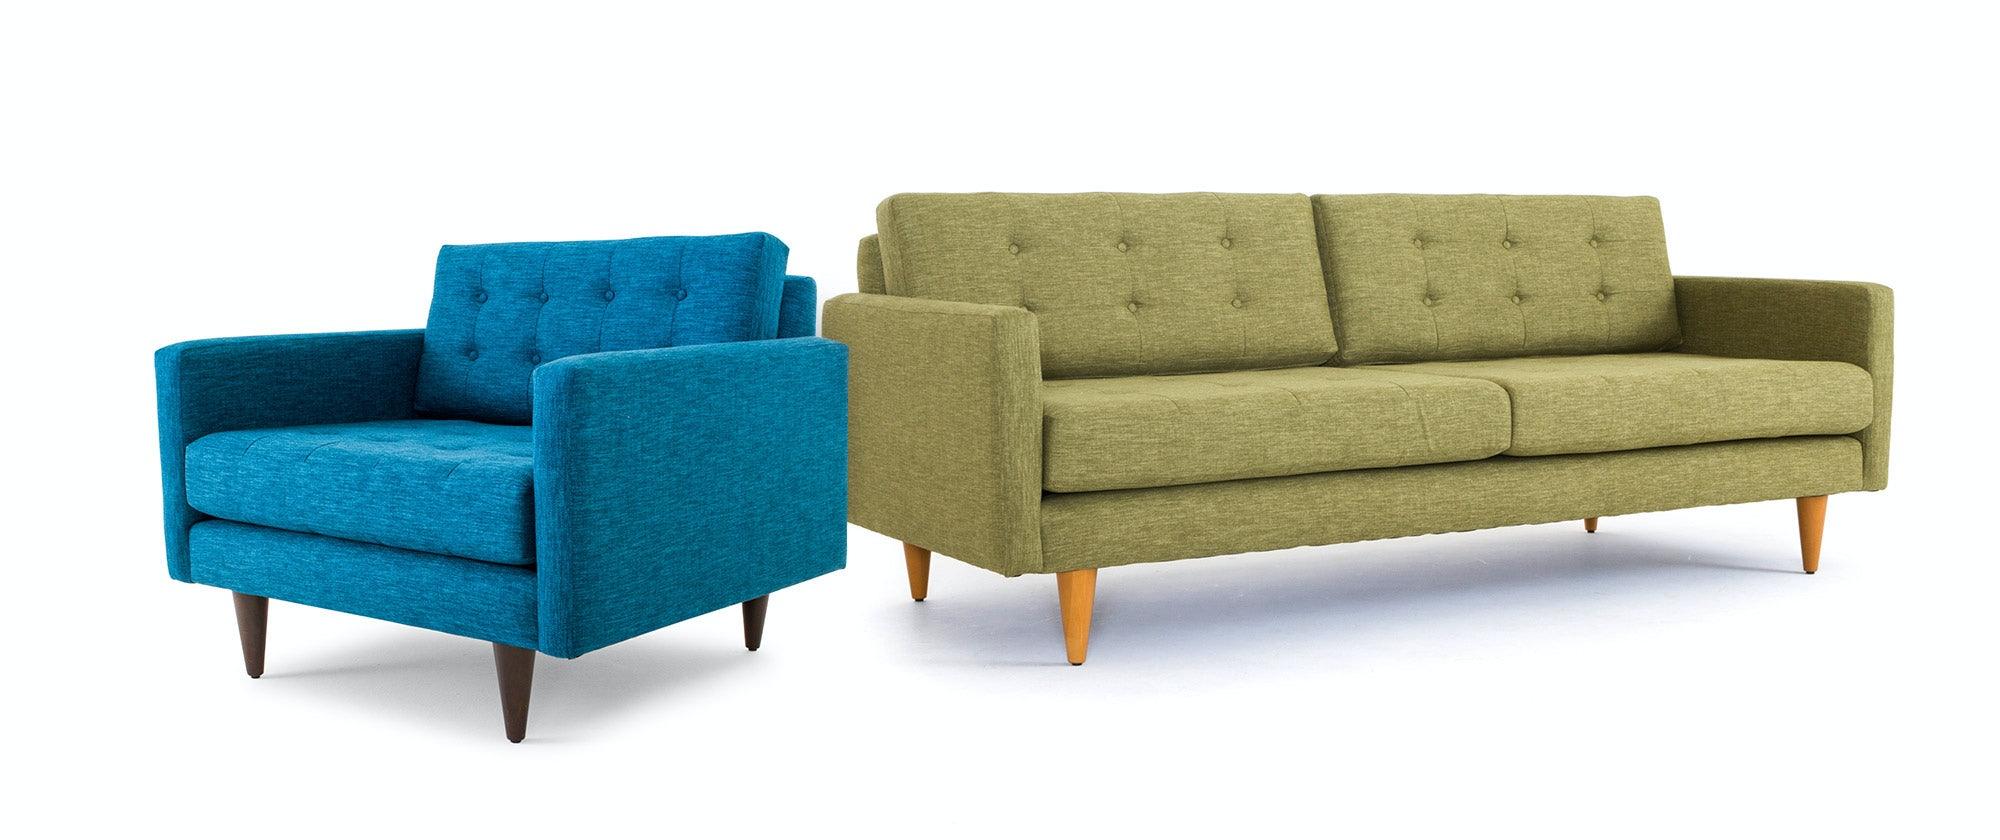 Prime Eliot Collection Joybird Machost Co Dining Chair Design Ideas Machostcouk